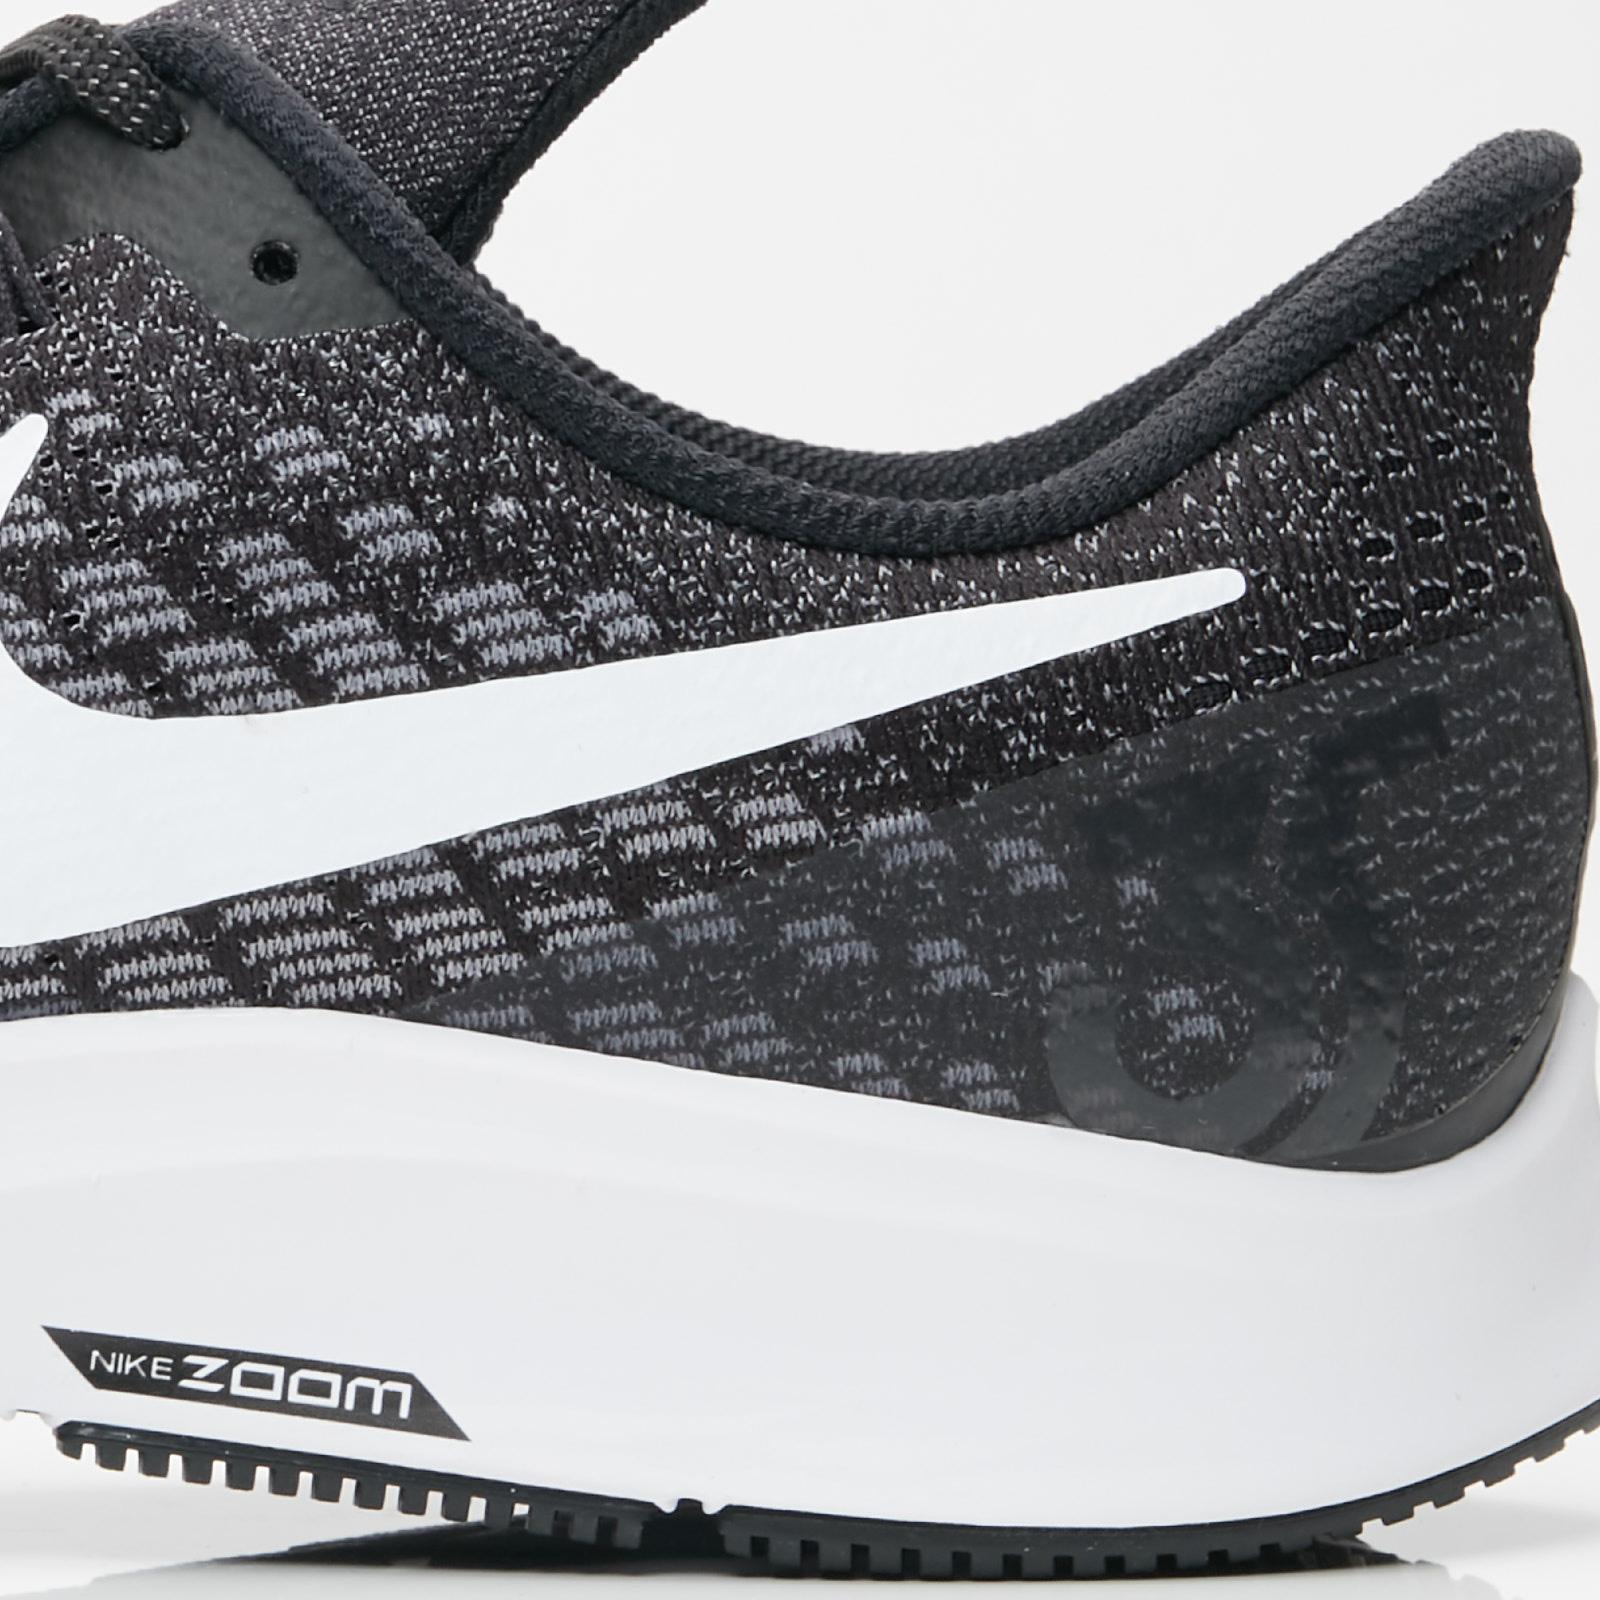 3bf8a13d1ab32 Nike Air Zoom Pegasus 35 - 942851-001 - Sneakersnstuff